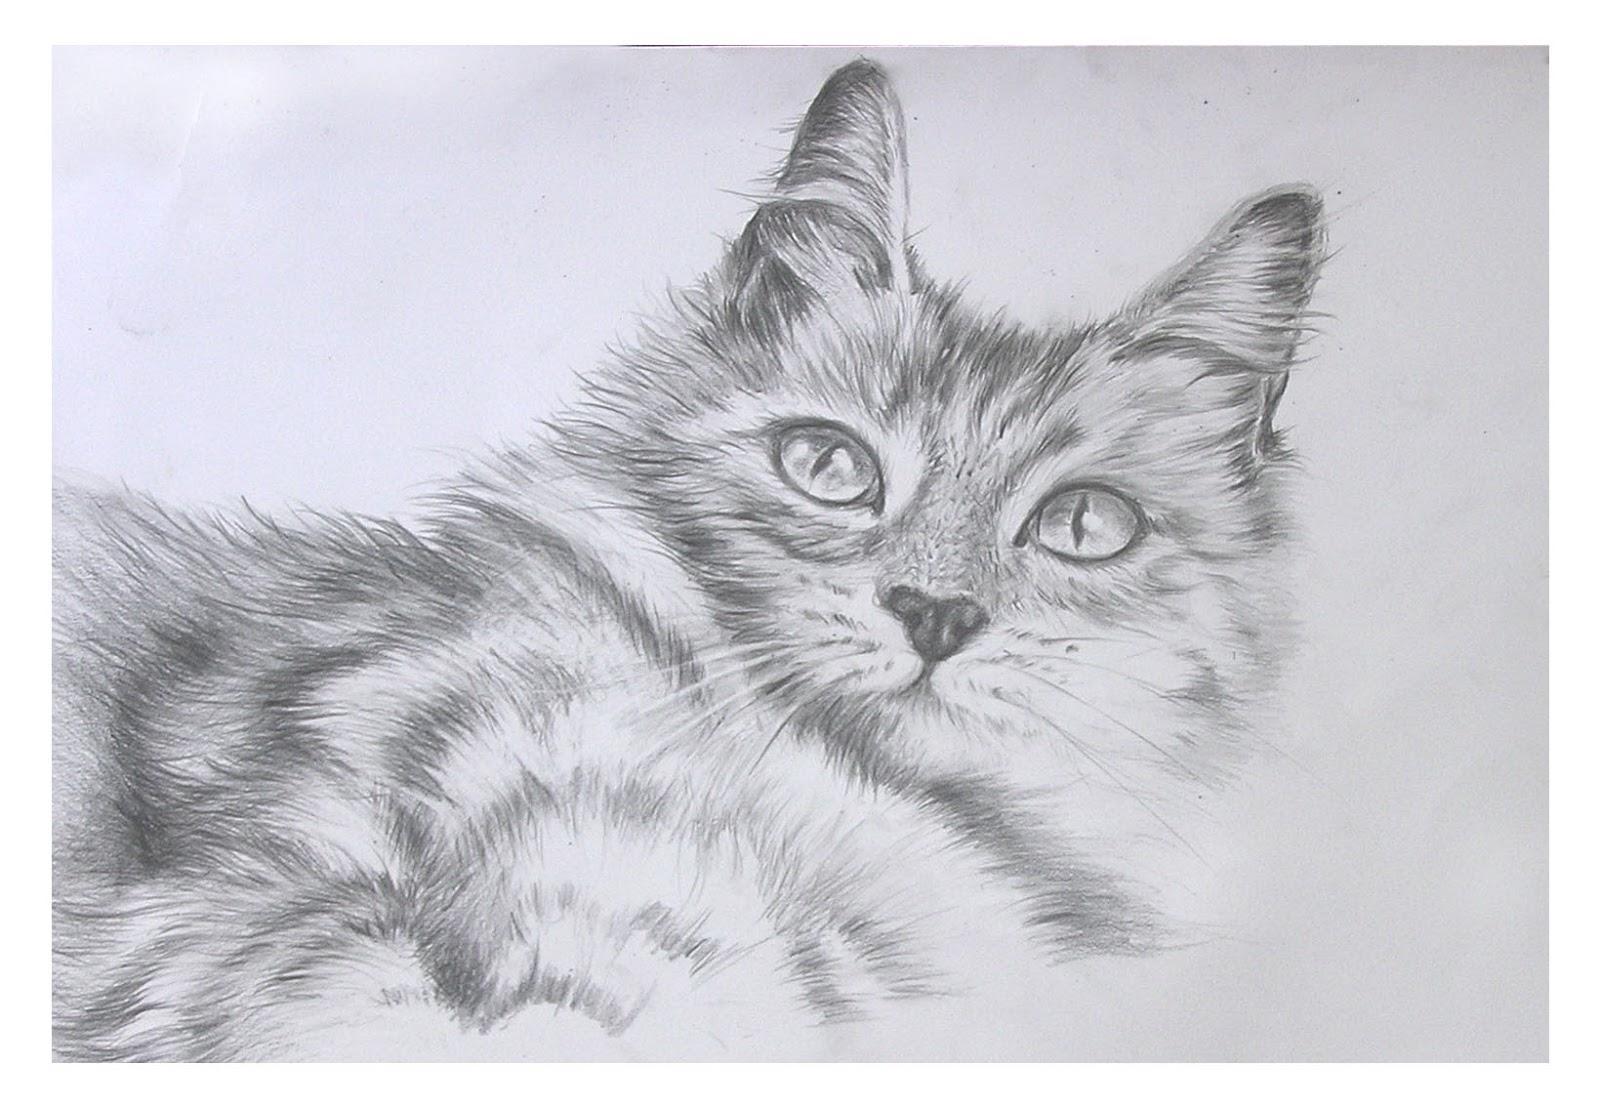 Download 78+  Gambar Kucing Lukisan Terlihat Keren HD